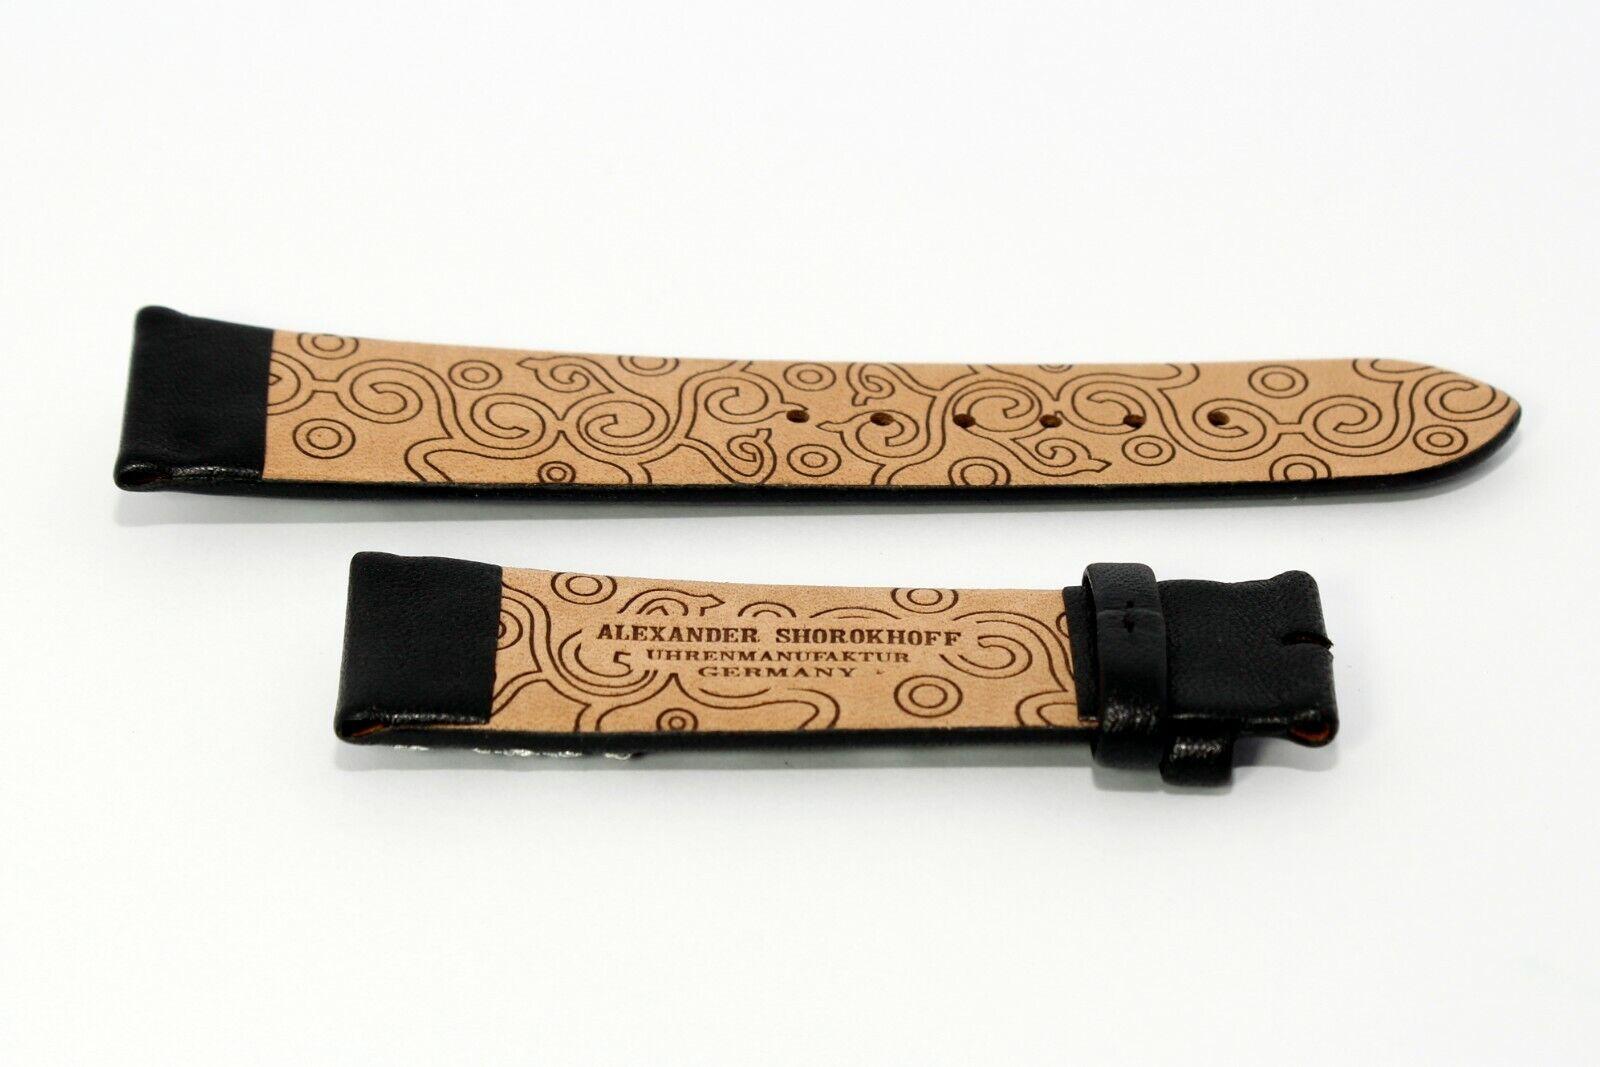 Damen Uhrenband Lederarmband 20 mm Schwarz mit Stickerei Kalbsleder SHOROKHOFF